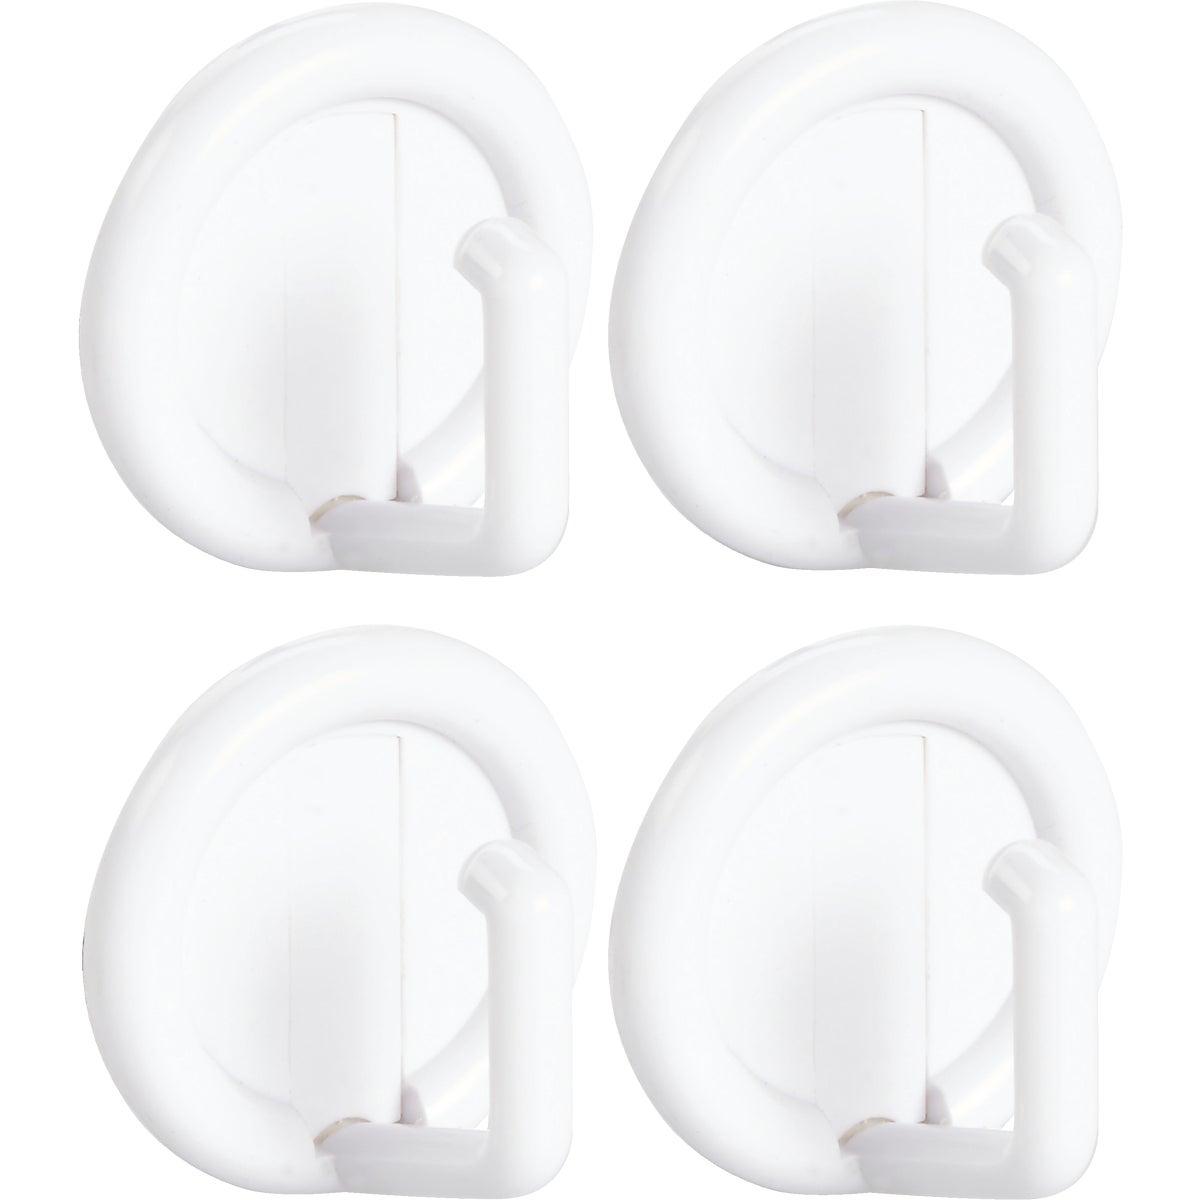 InterDesign Utility Adhesive Hook, 15001